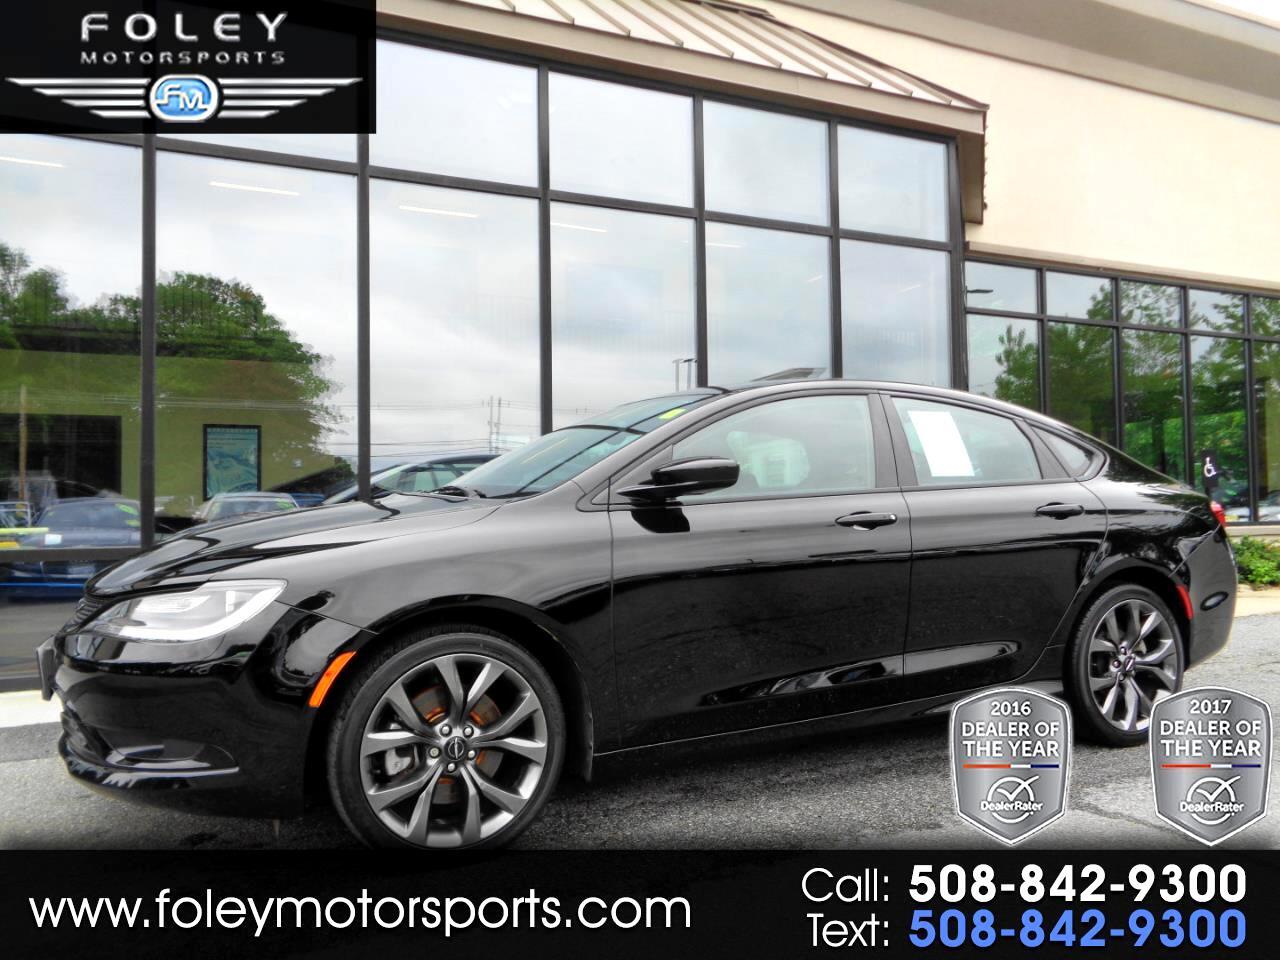 2015 Chrysler 200 4dr Sdn S AWD